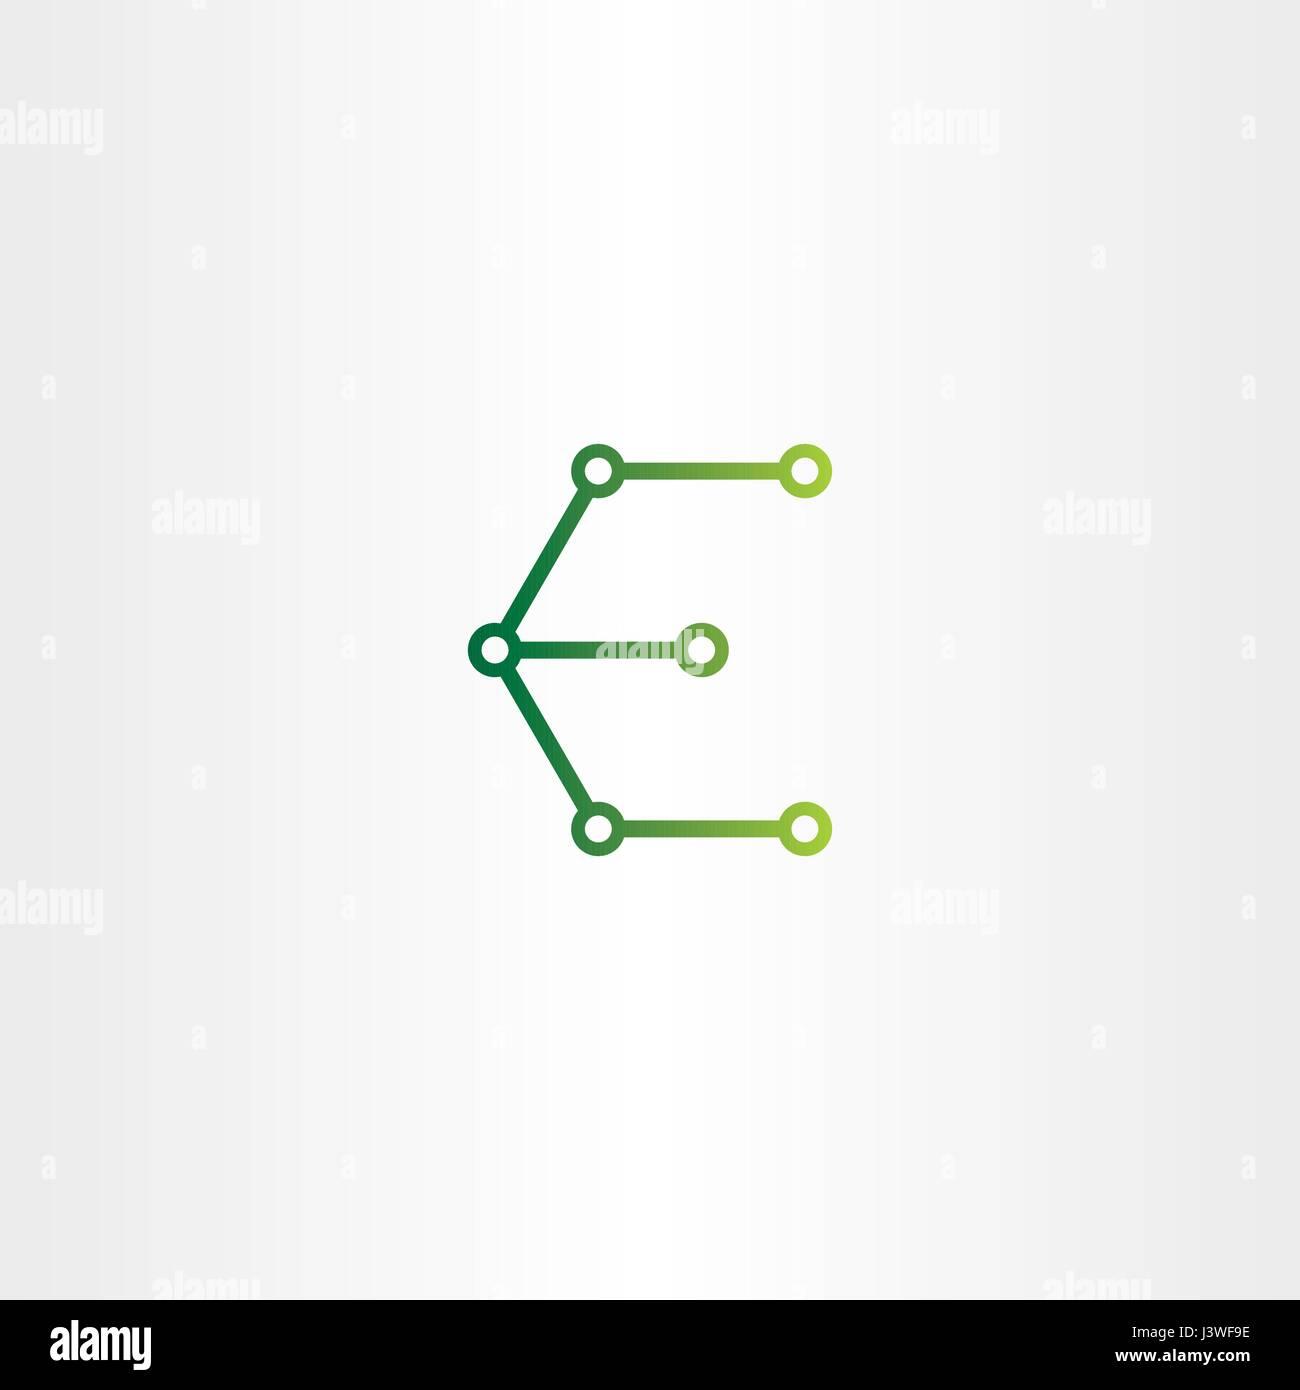 Buchstabe e Logo Elektronik Schaltung Symbol Vektor symbol Vektor ...